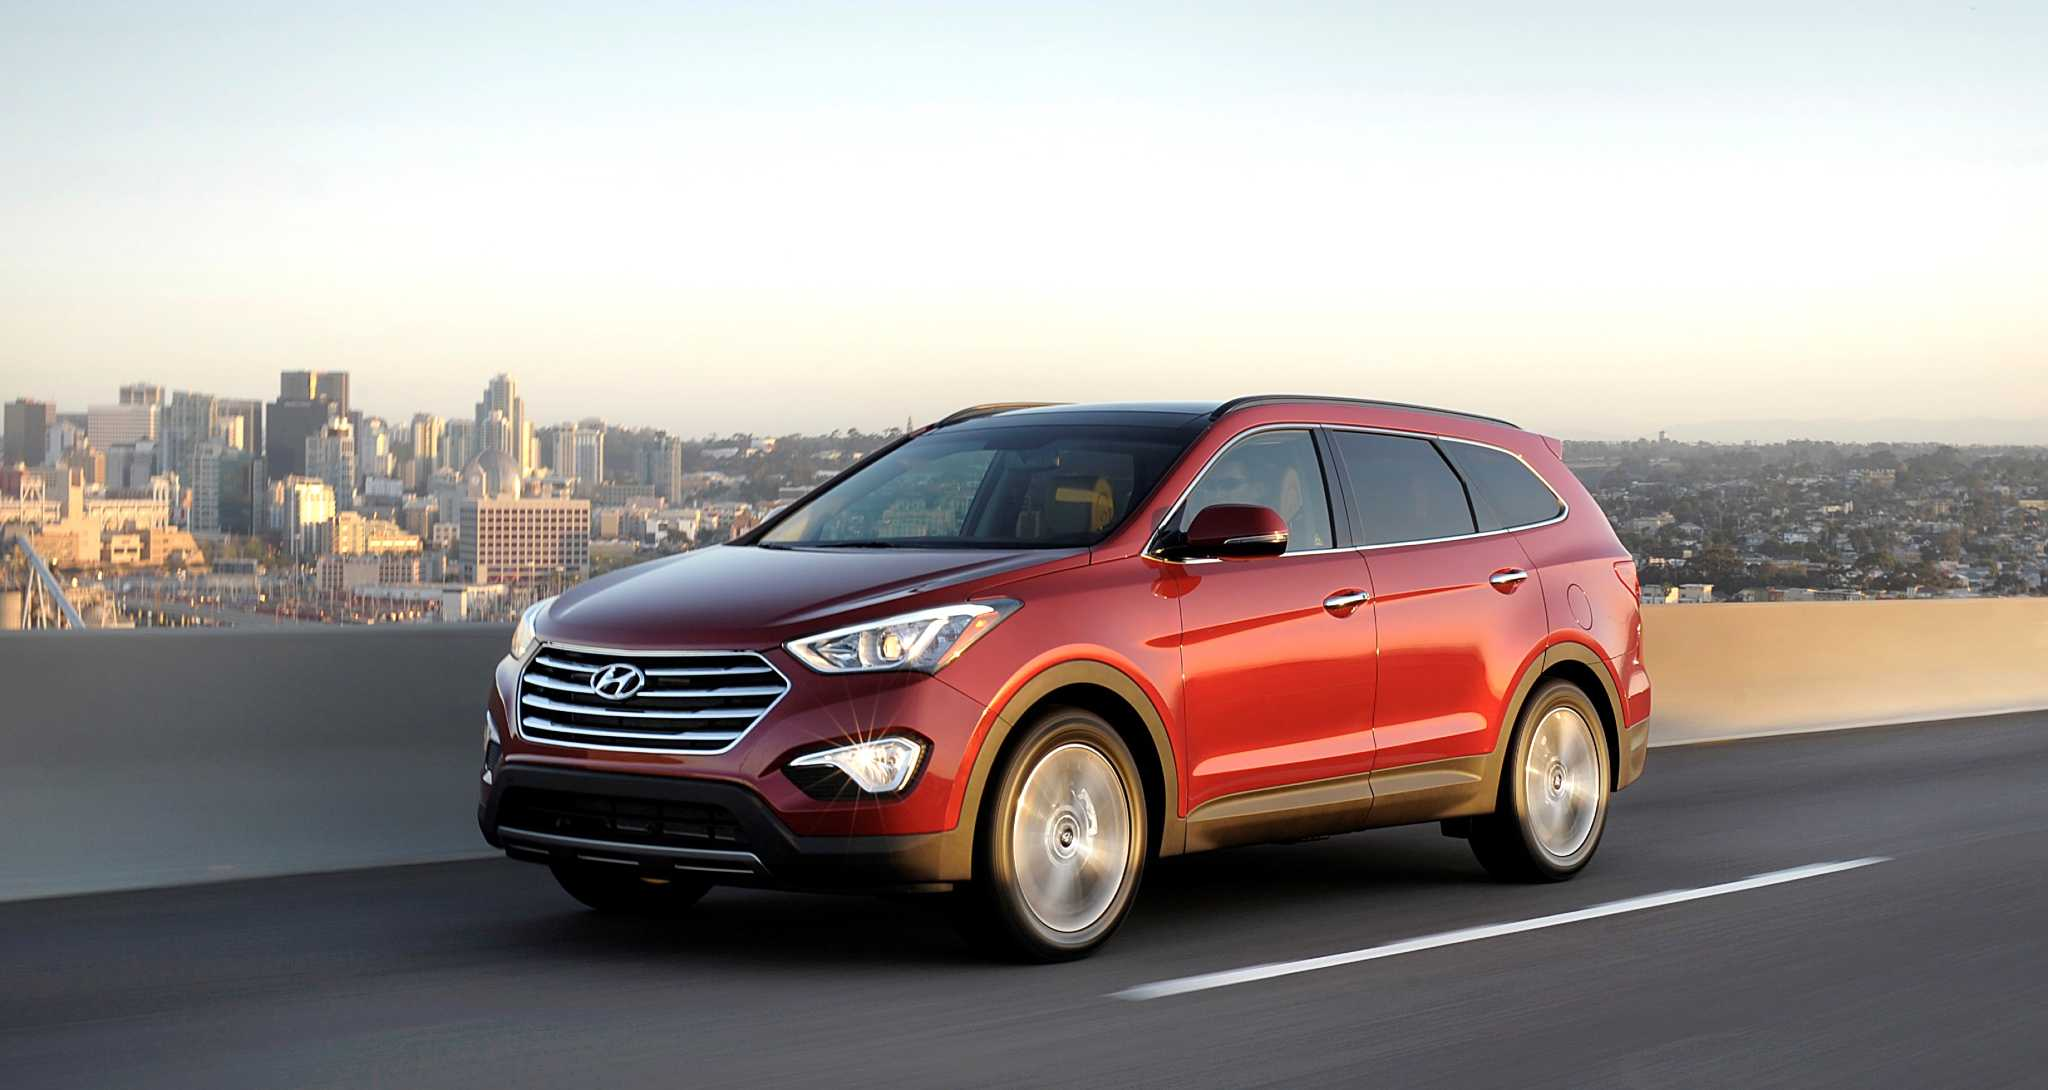 2015 Hyundai three-row Santa Fe easy on eyes, budget